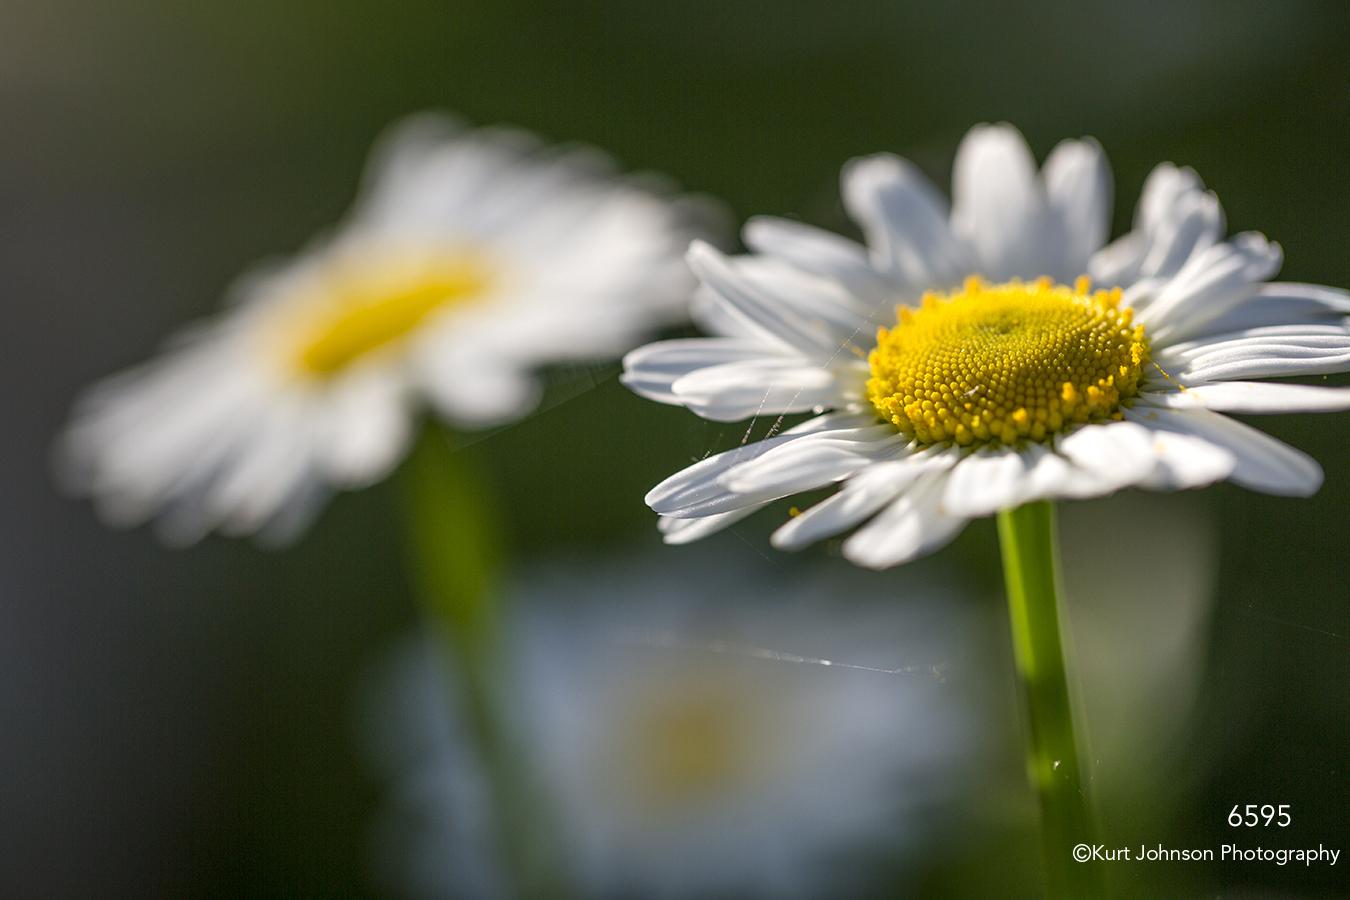 flower flowers white daisies daisy